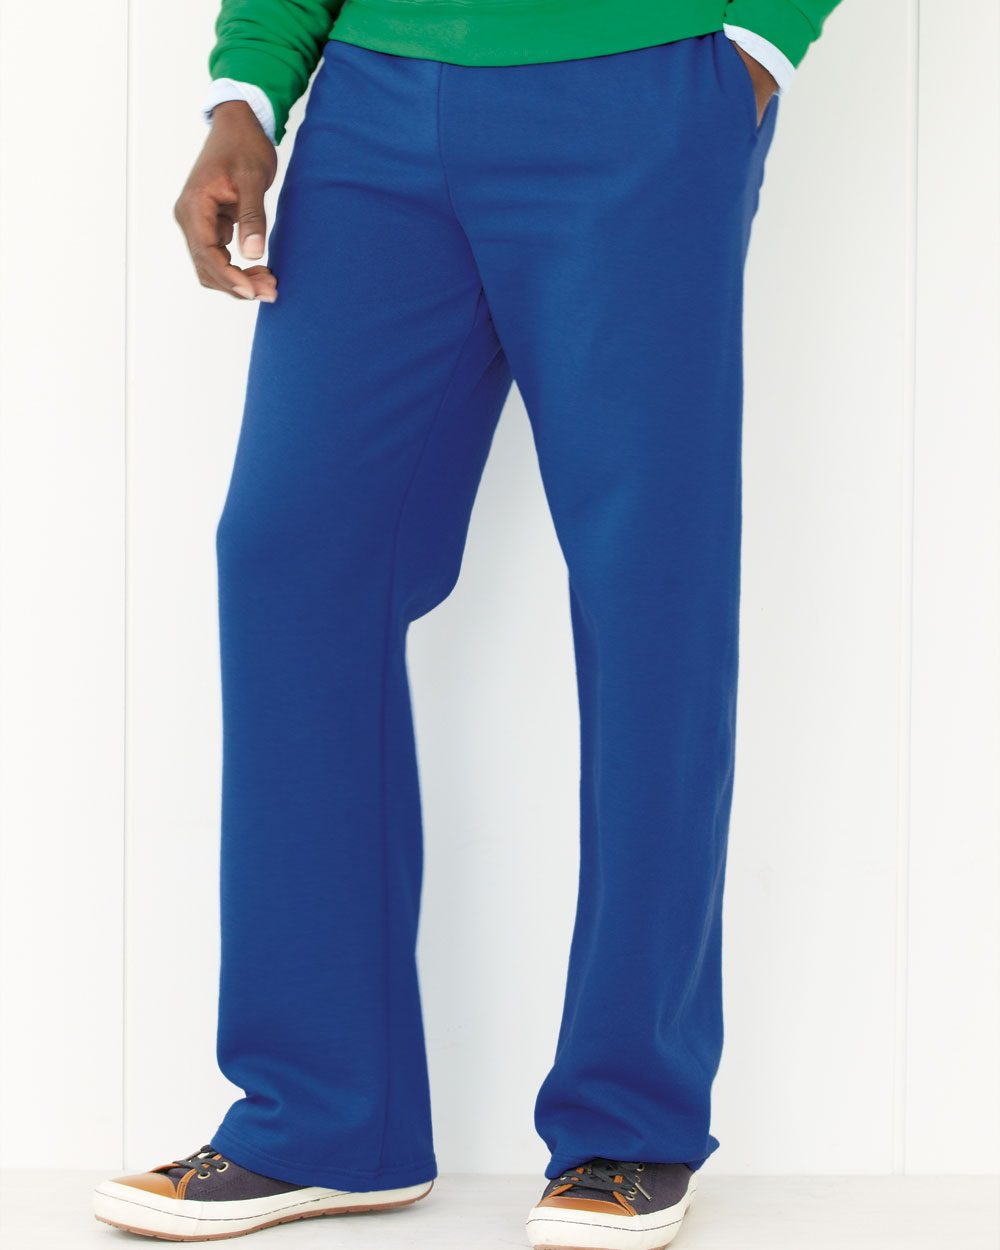 JERZEES 974MPR - NuBlend Open Bottom Pocketed Sweatpants